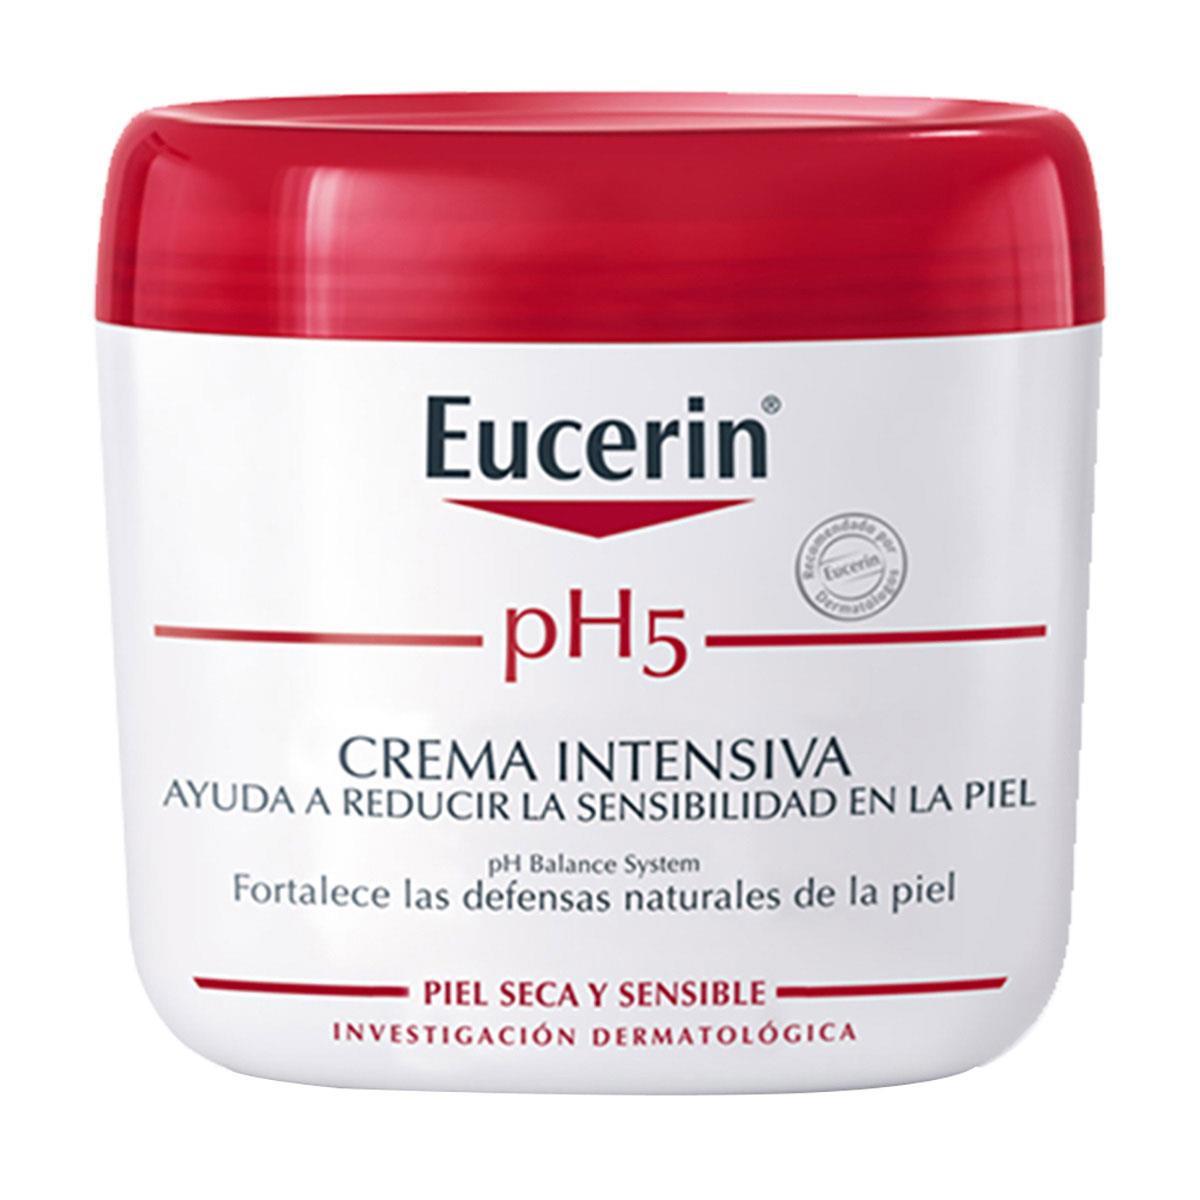 Eucerin Ph5 1 Tarro Crema 450 Ml